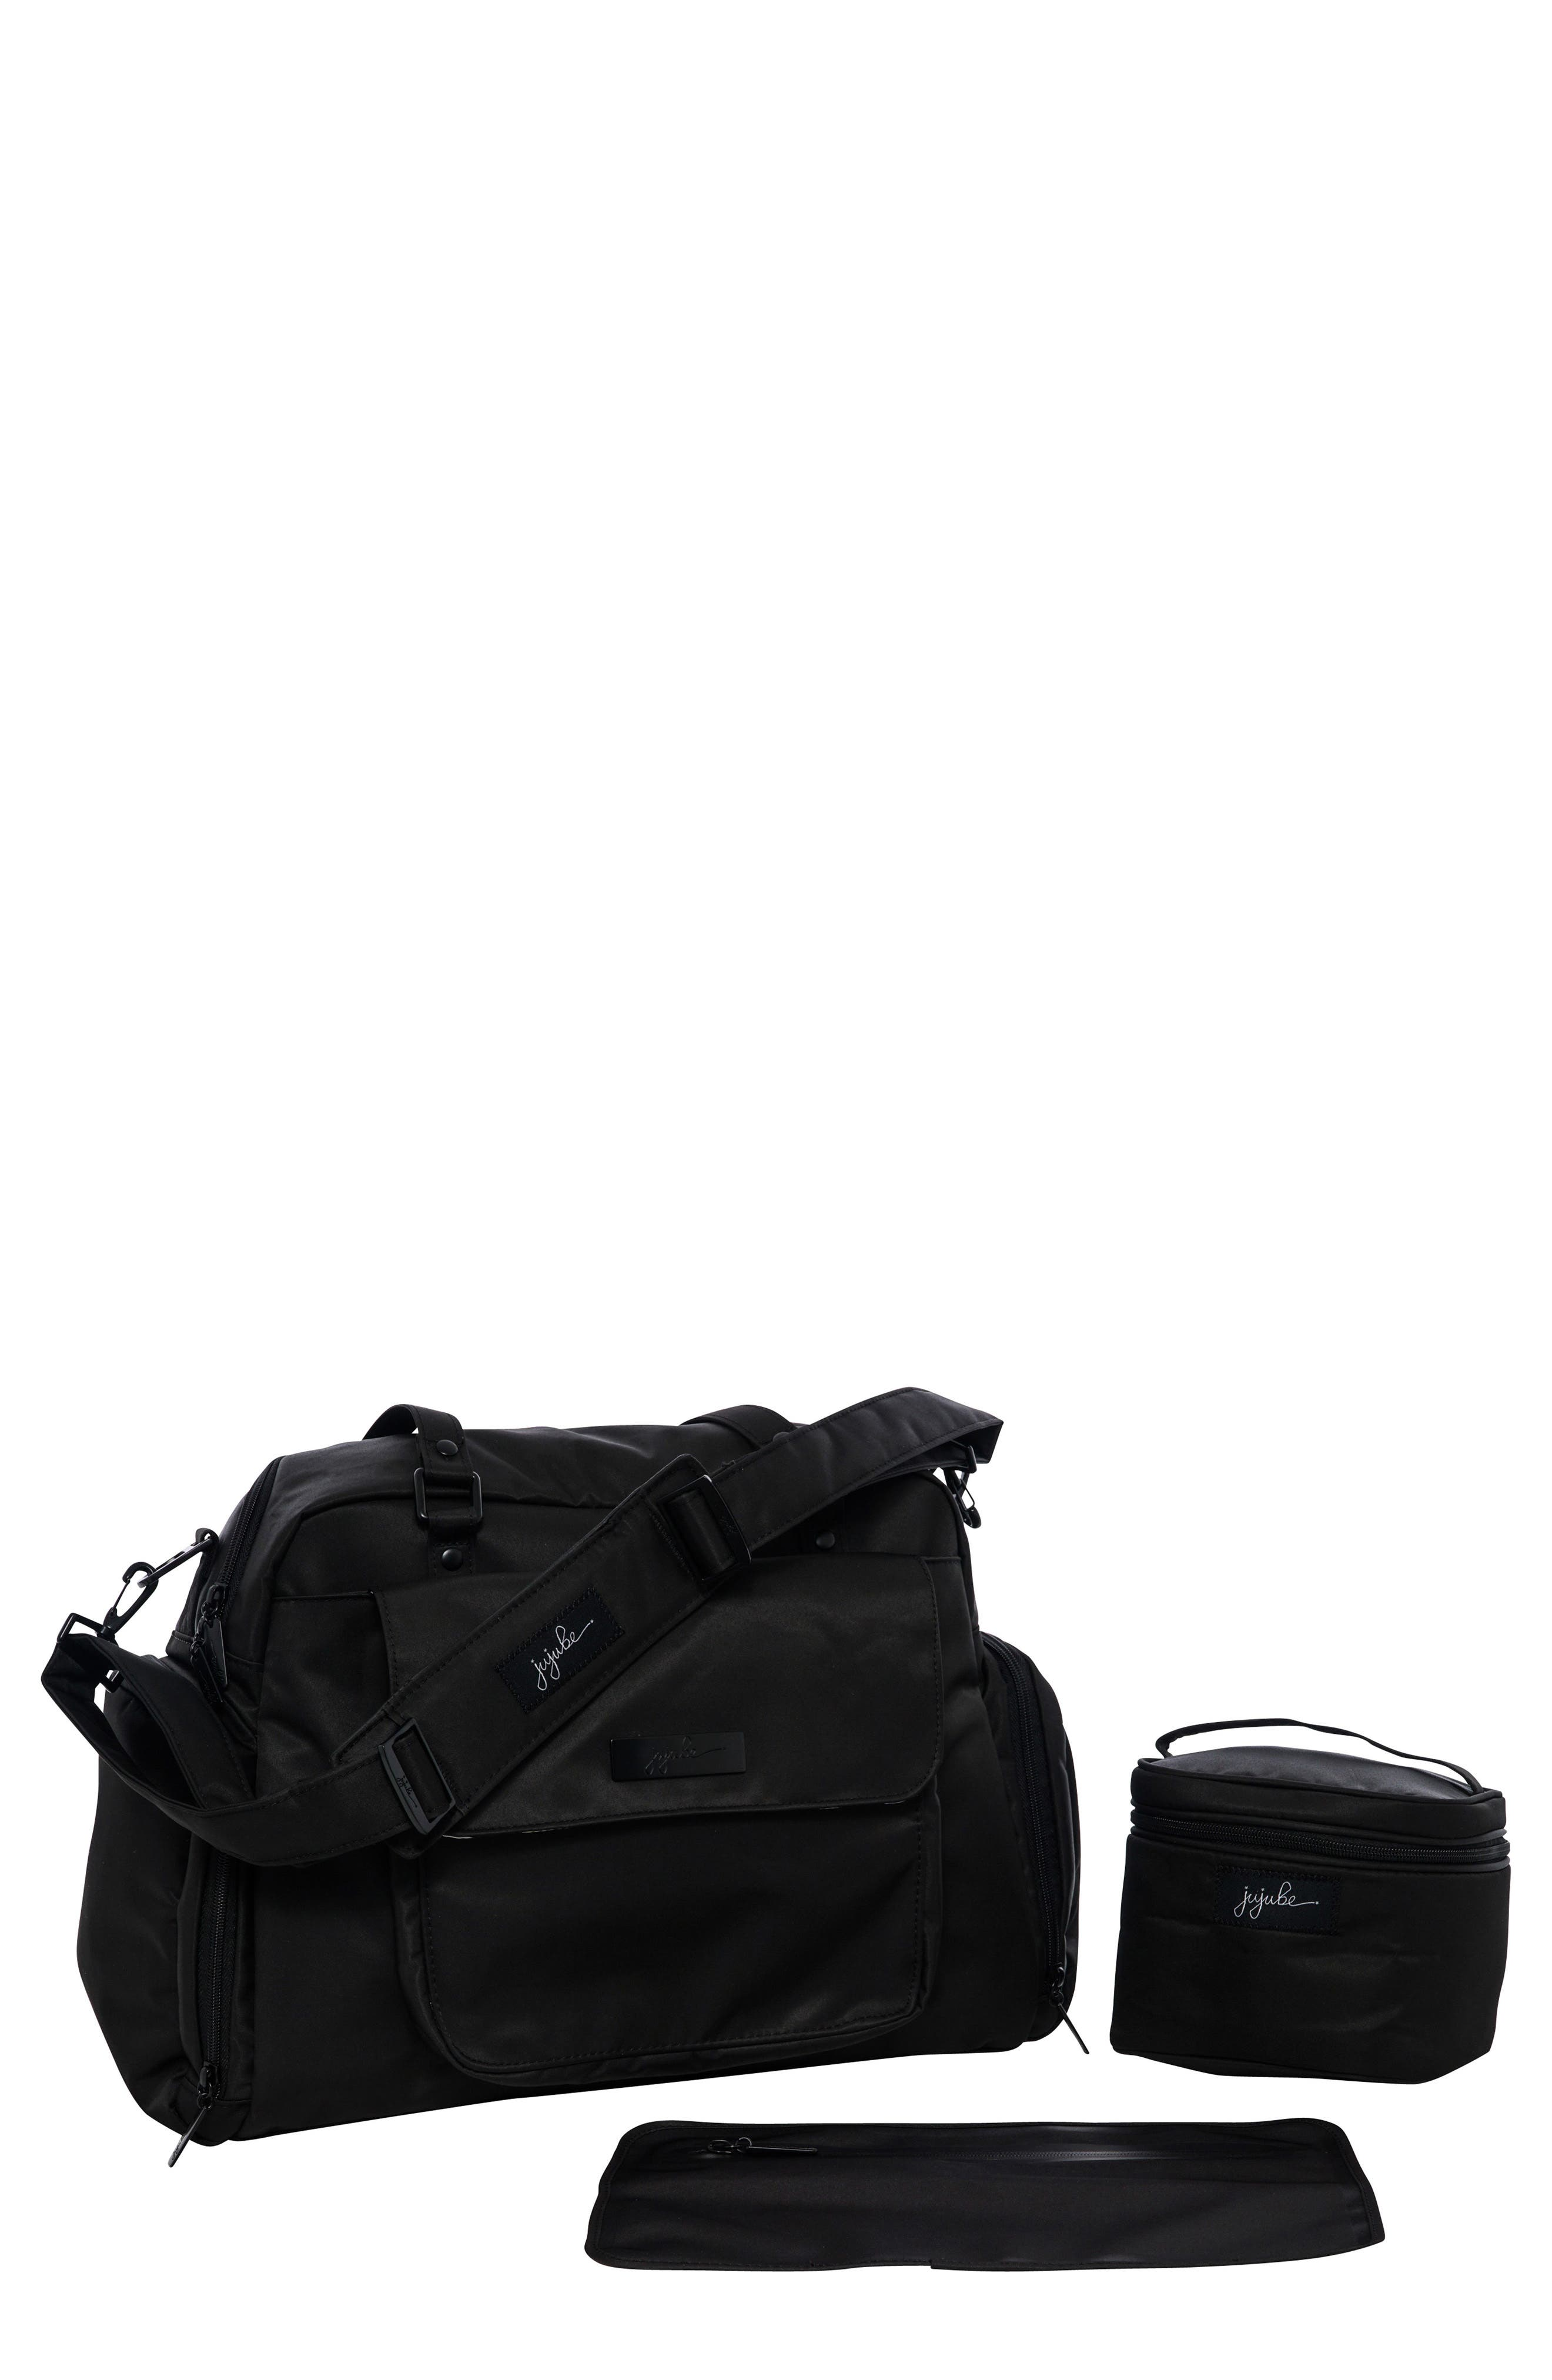 Ju-Ju-Be Onyx Be Pumped Bag